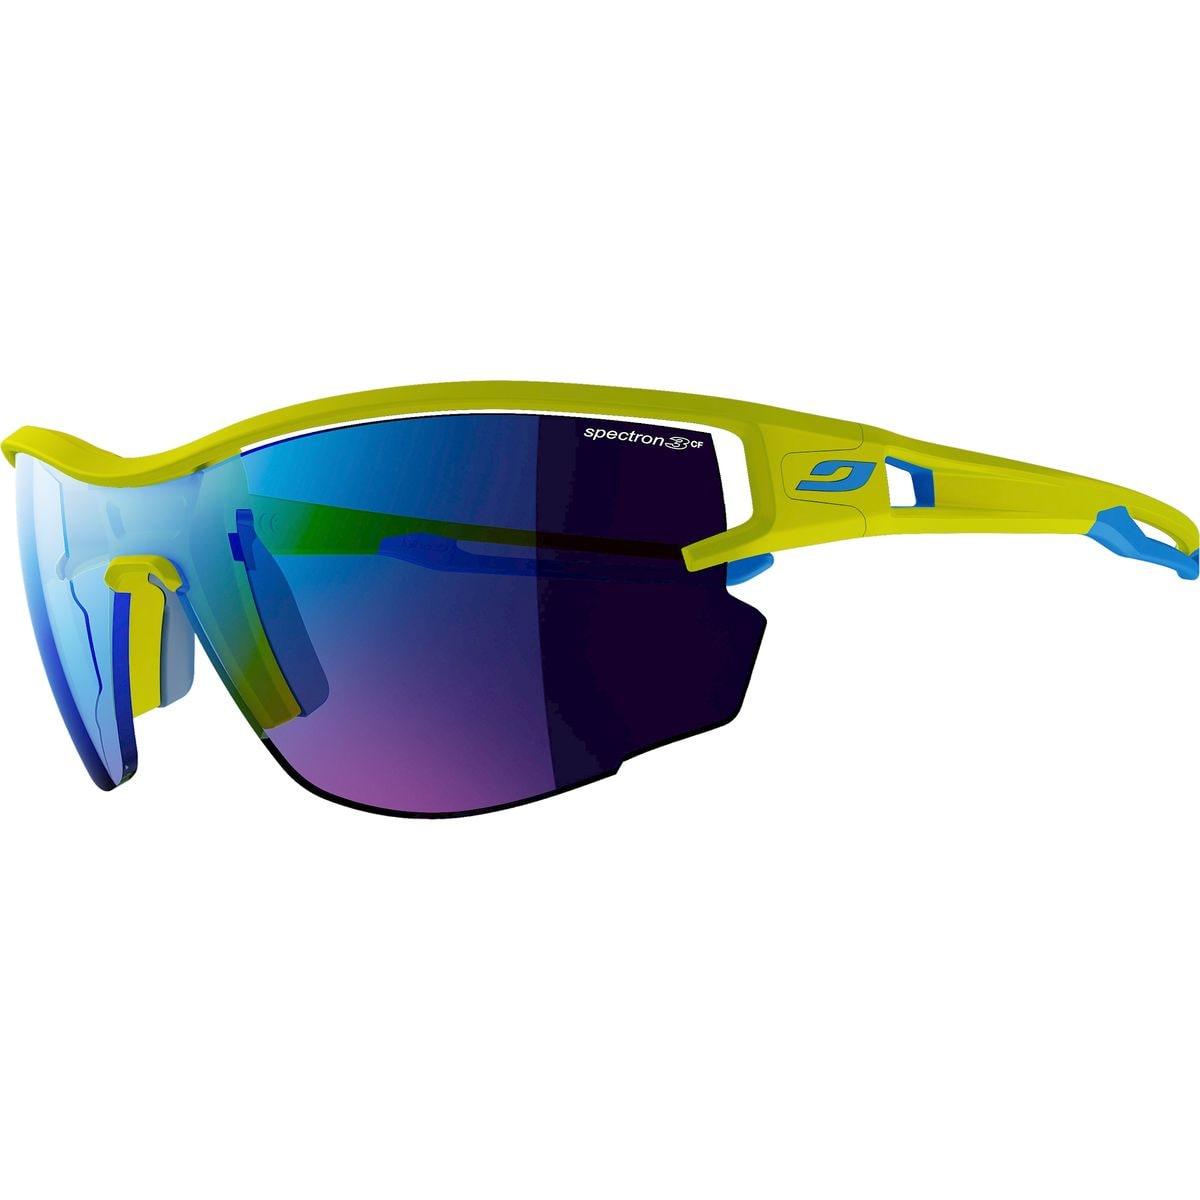 Julbo Aero Sunglasses  Spectron 3 CF Green Blue Spectron 3 CF One Size